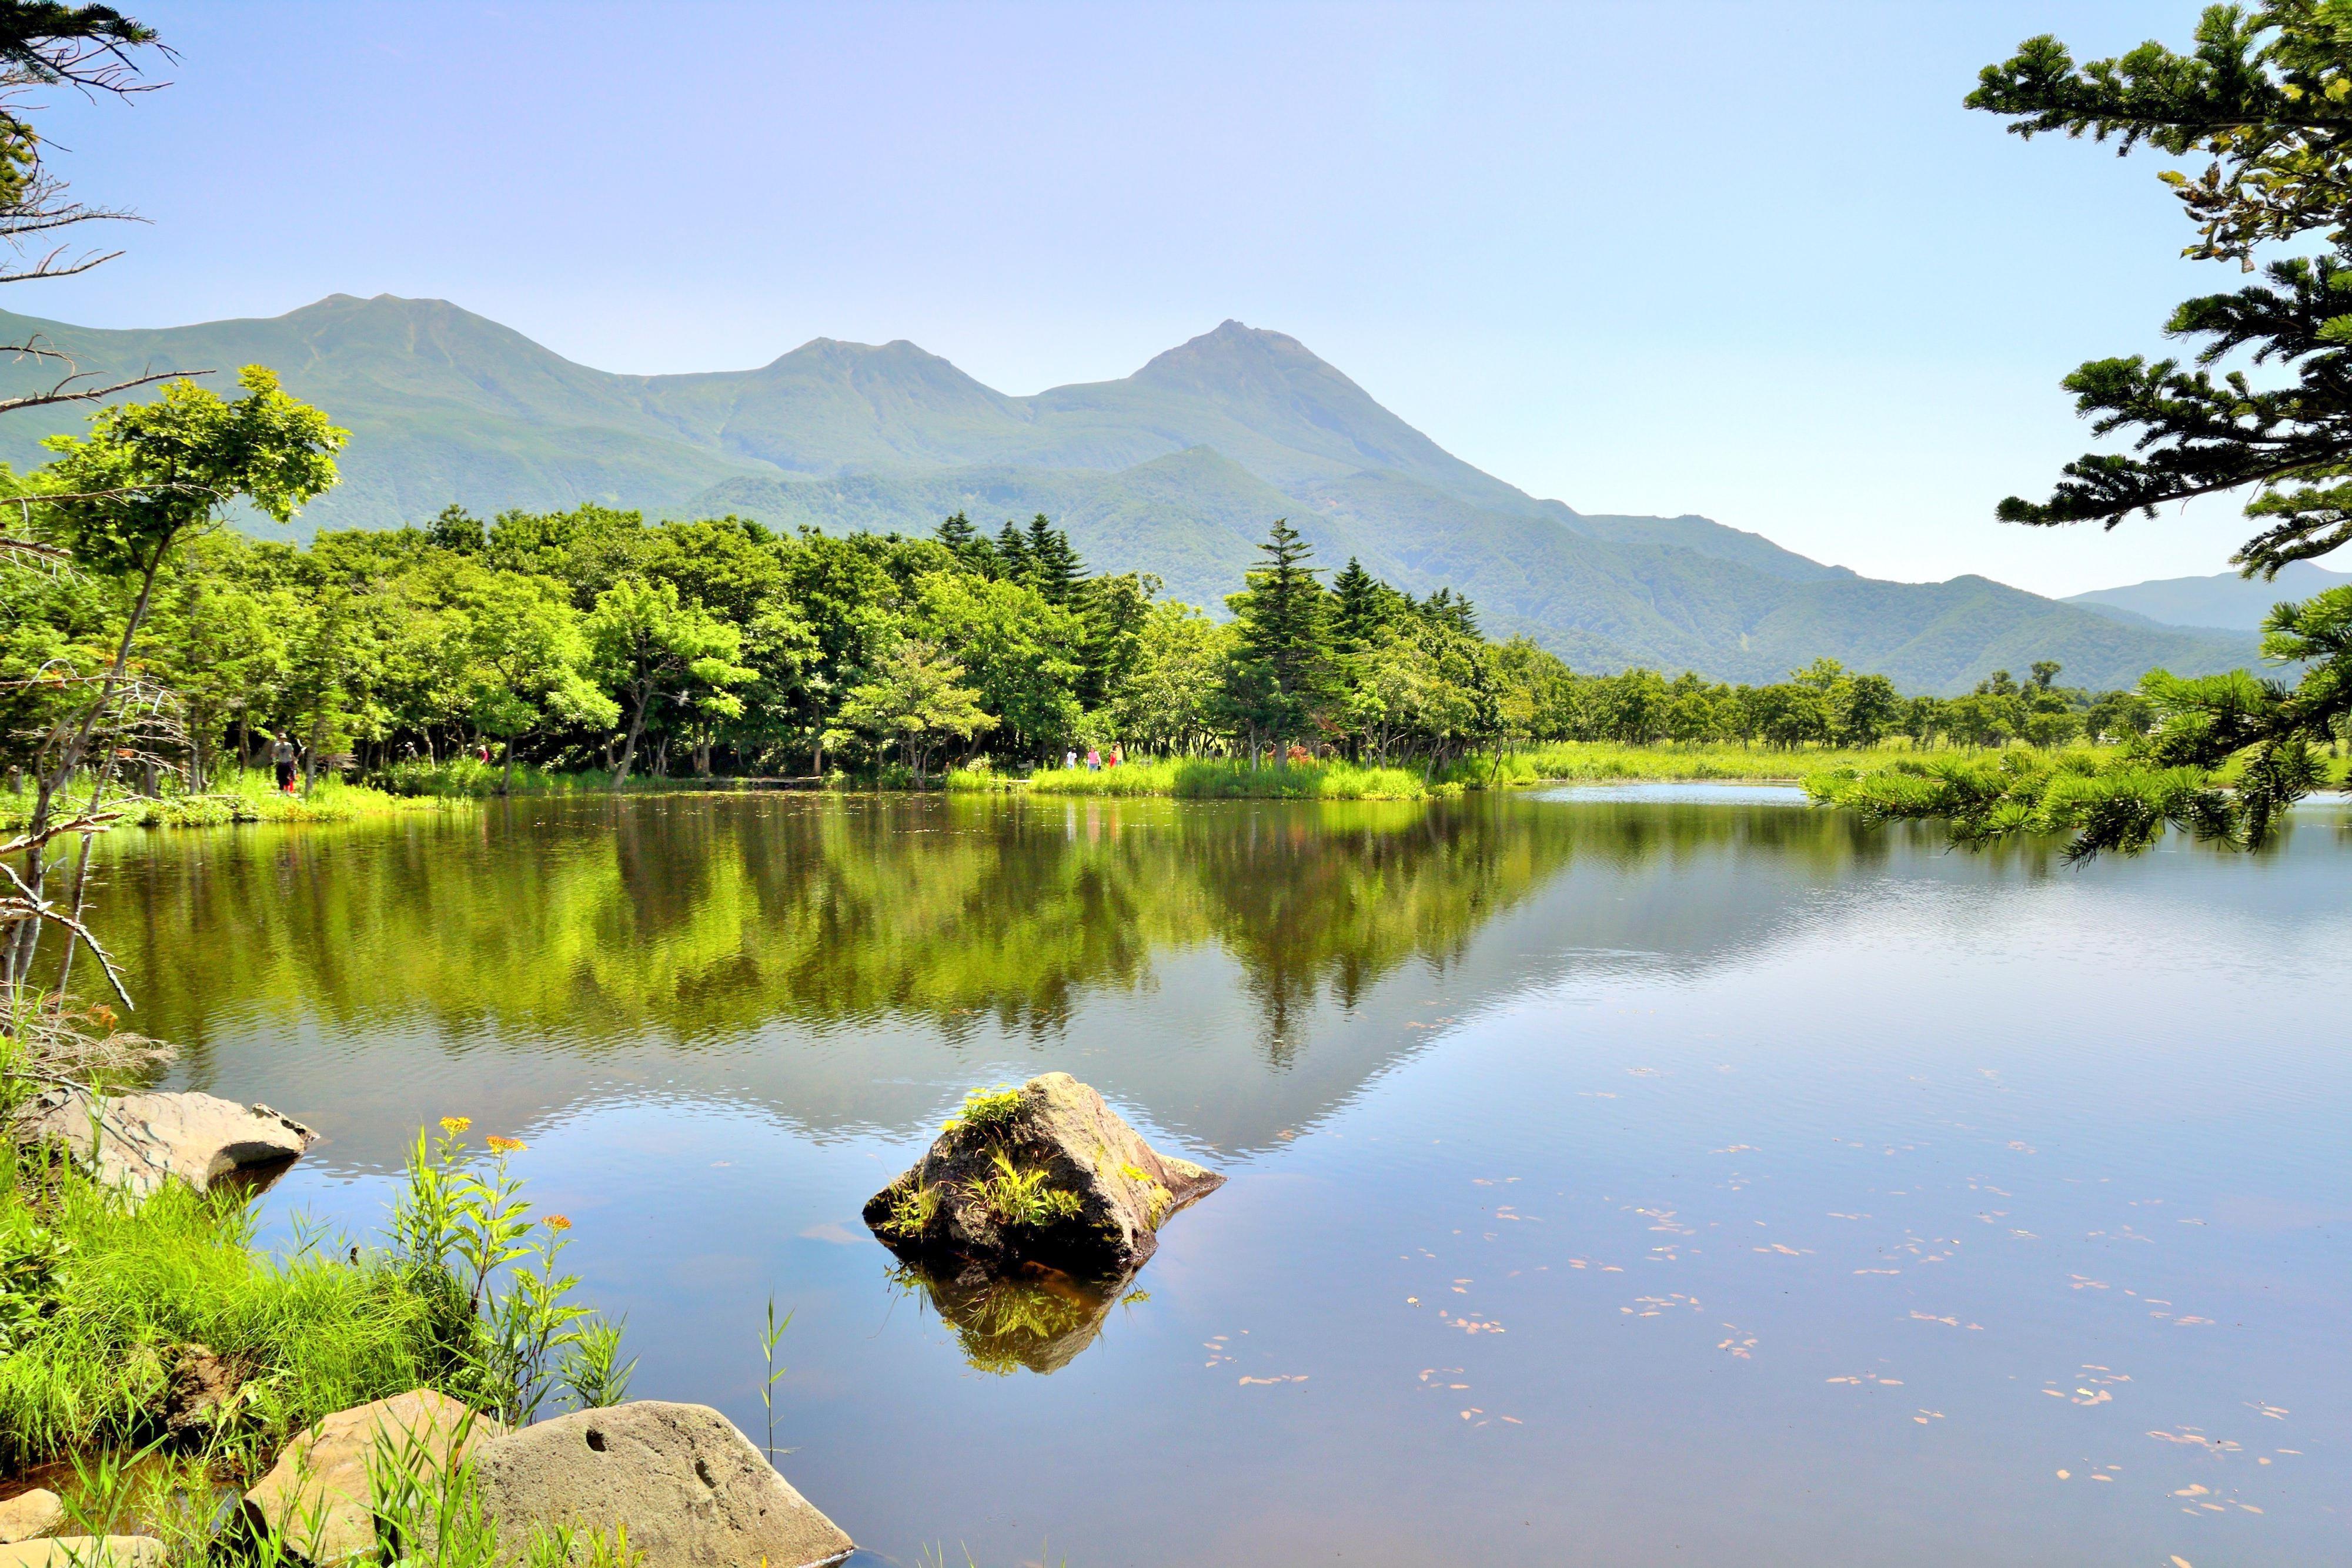 Shiretoko Peninsula